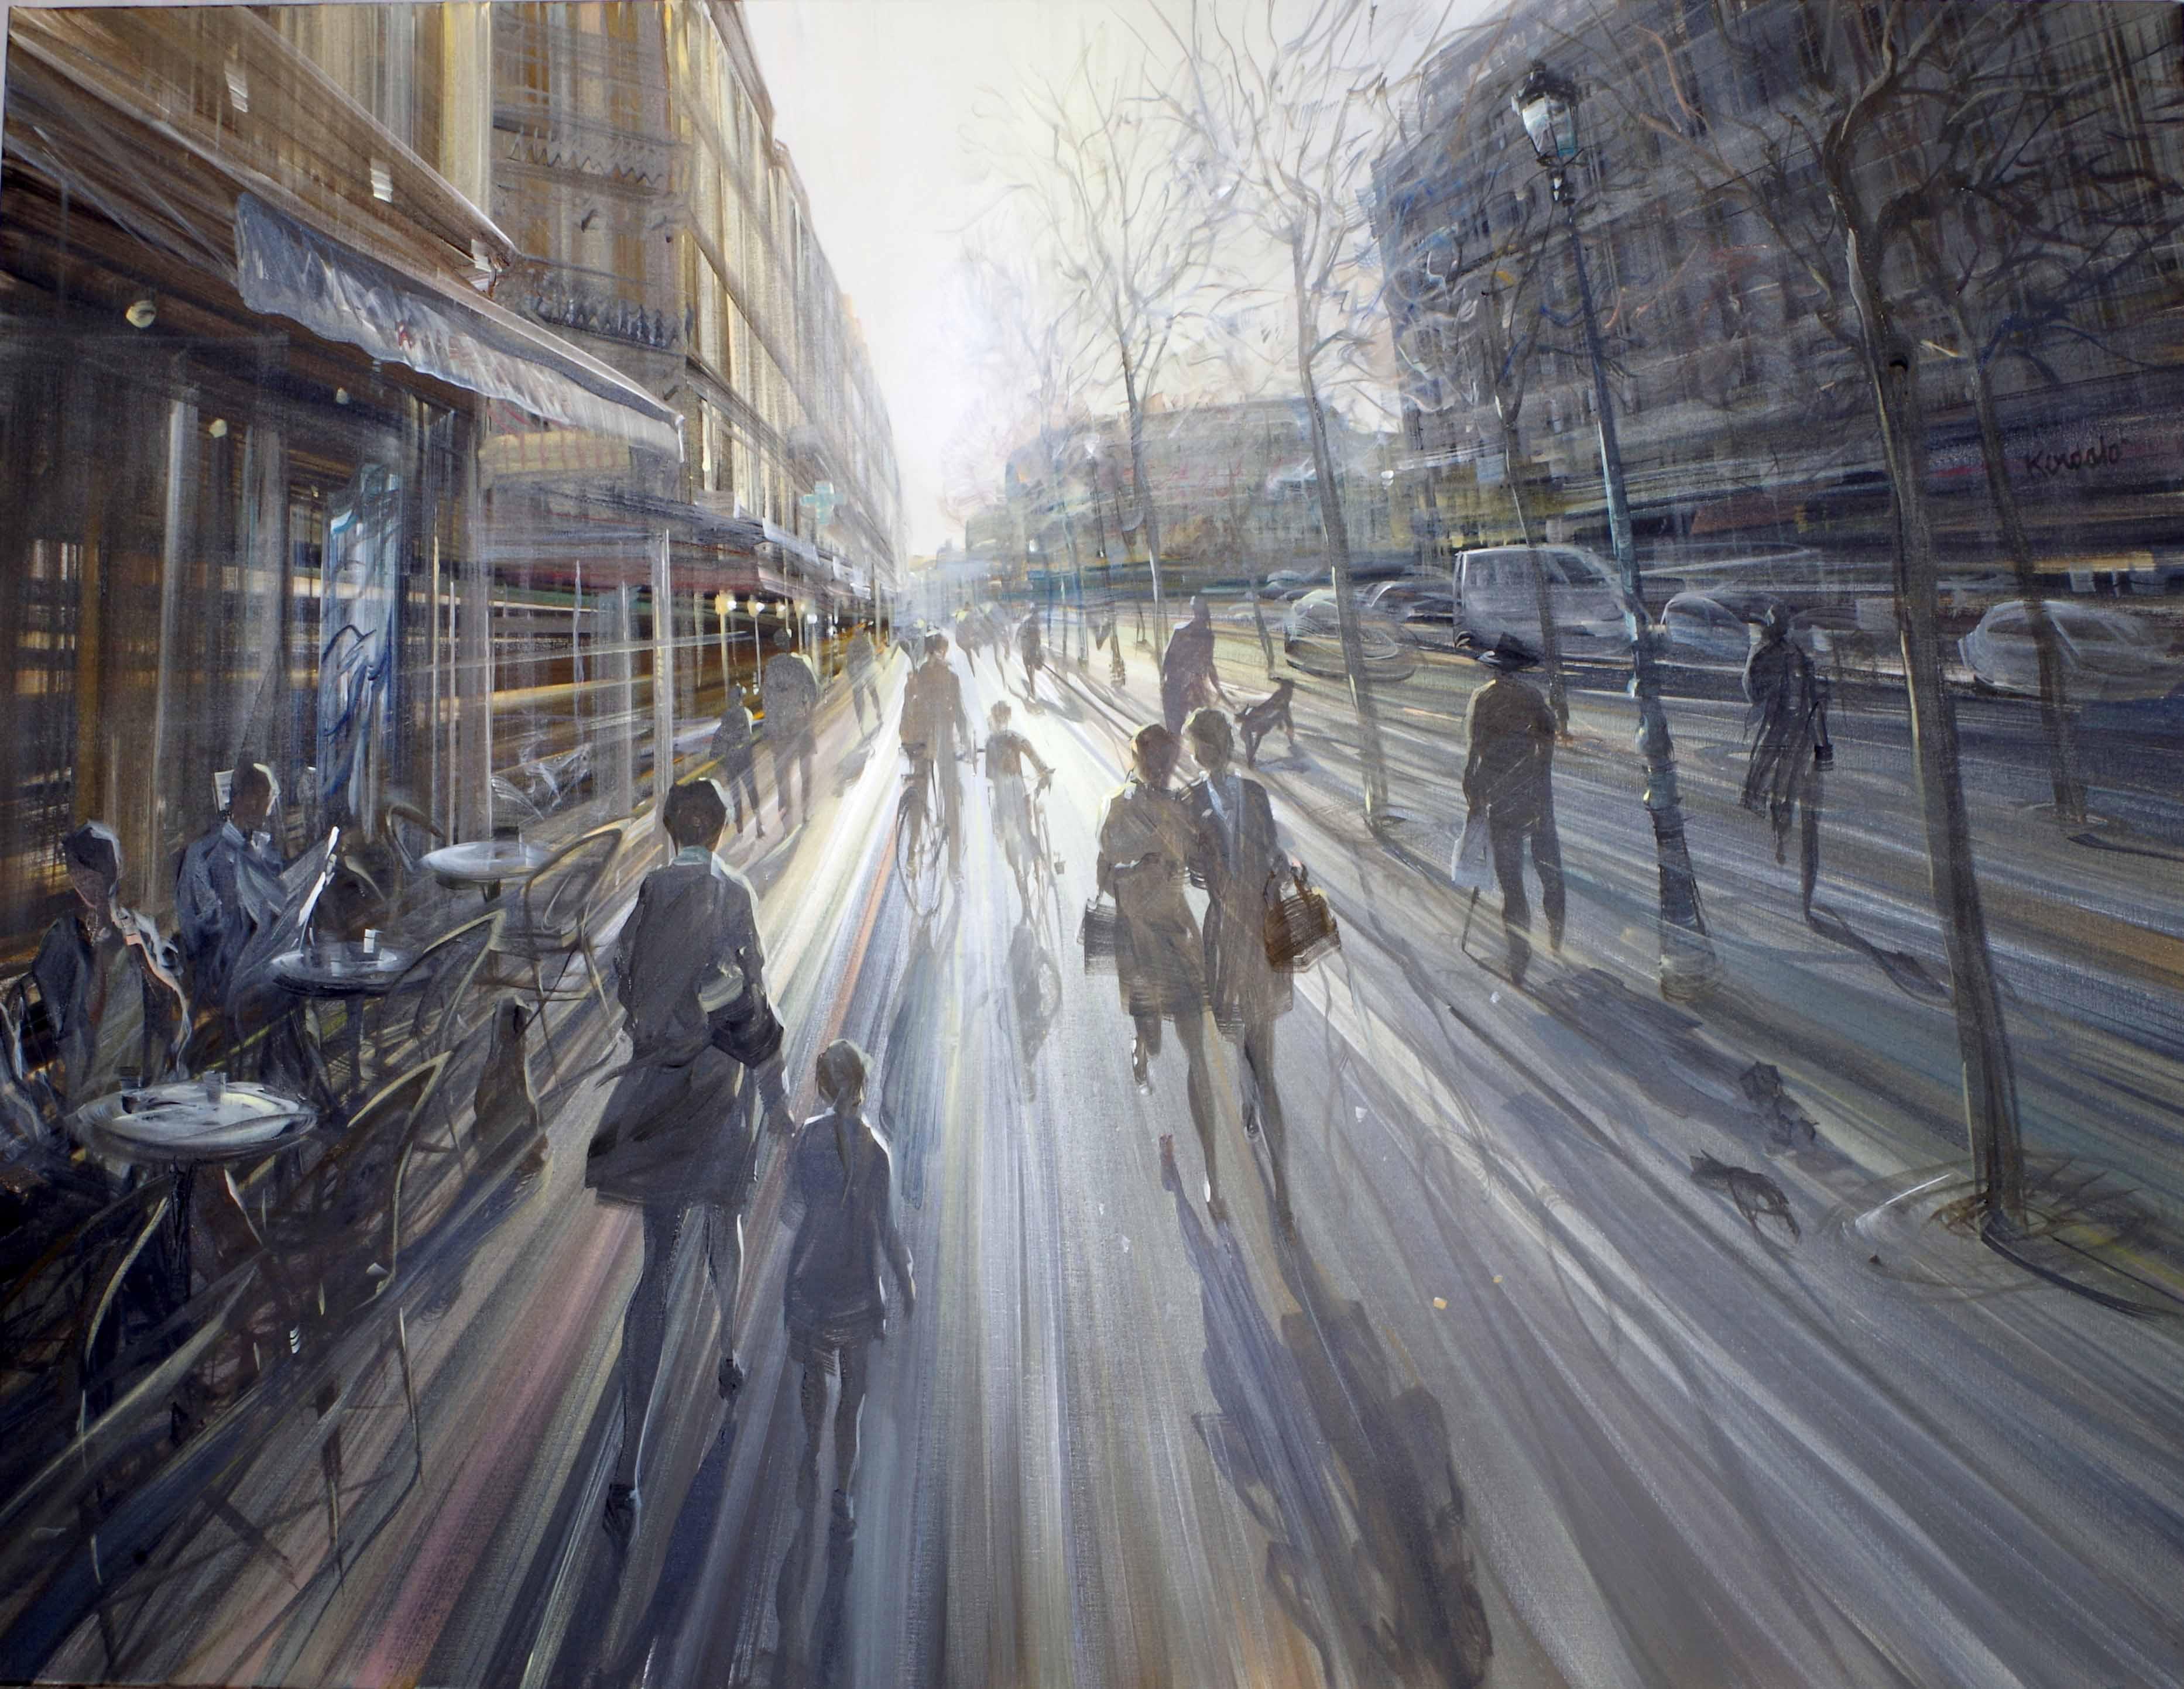 kerdalo artiste peinture paris 4eme